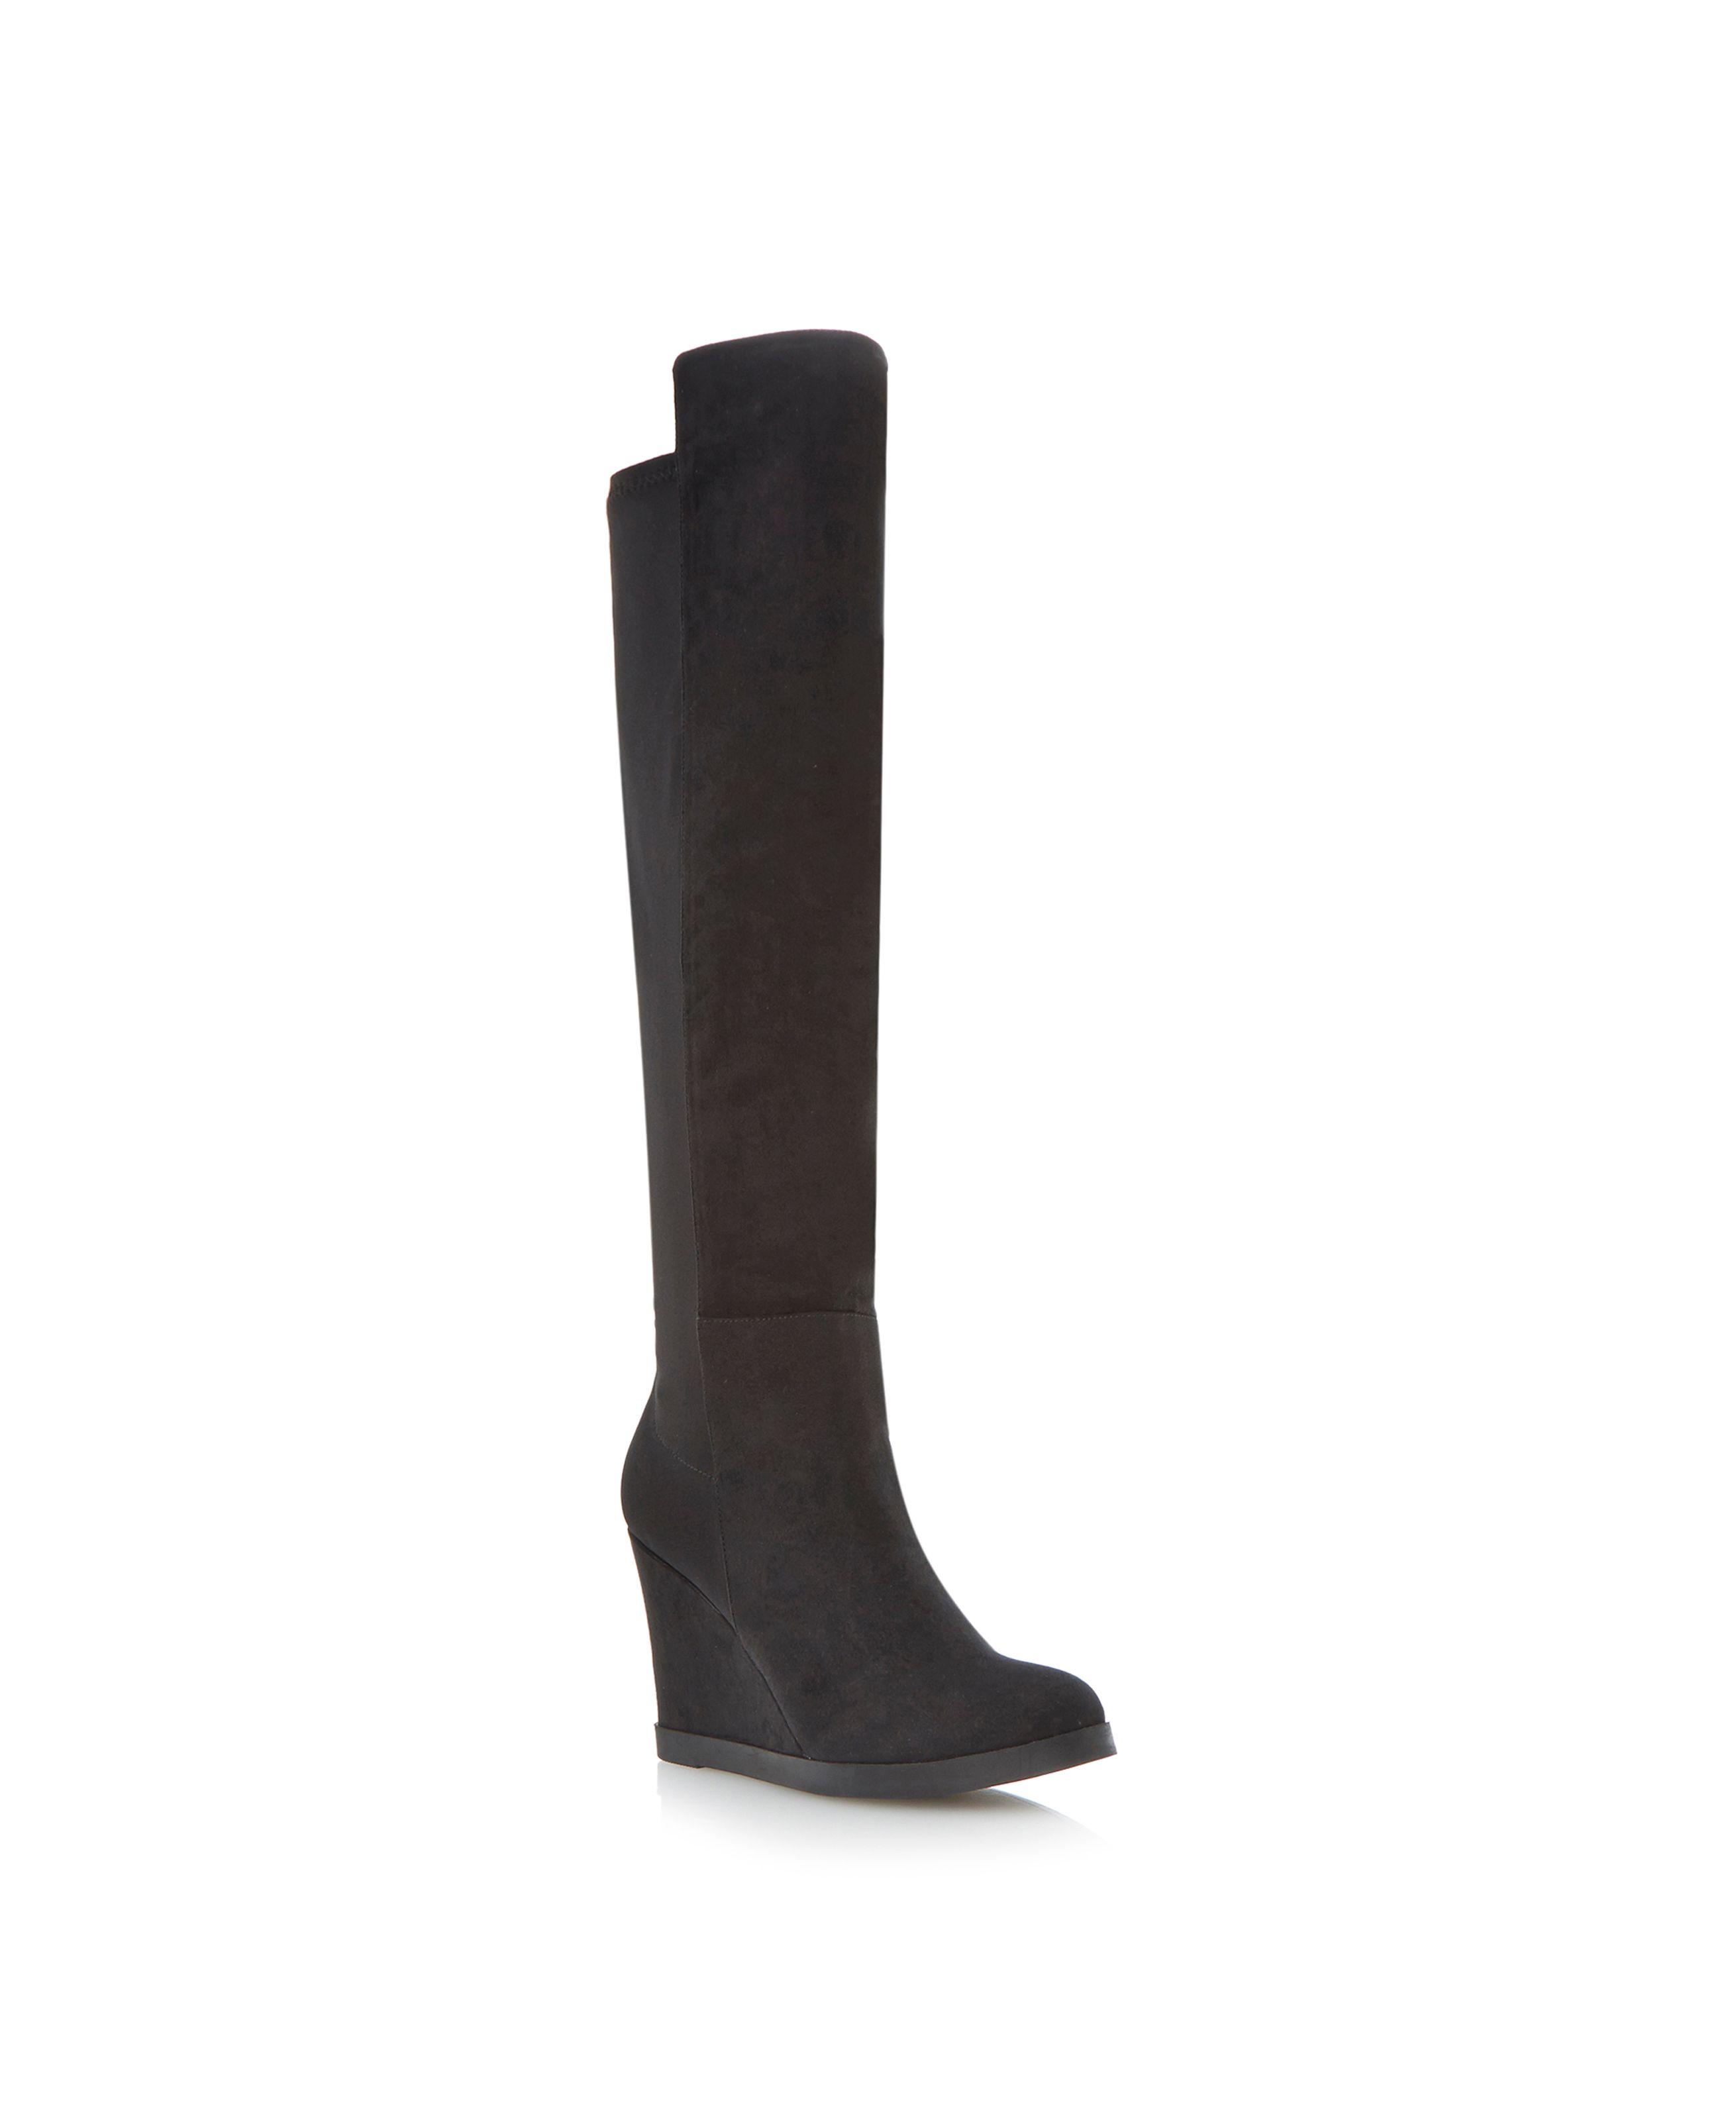 Dune Safiya Wedge Heel Over The Knee Boot in Black | Lyst